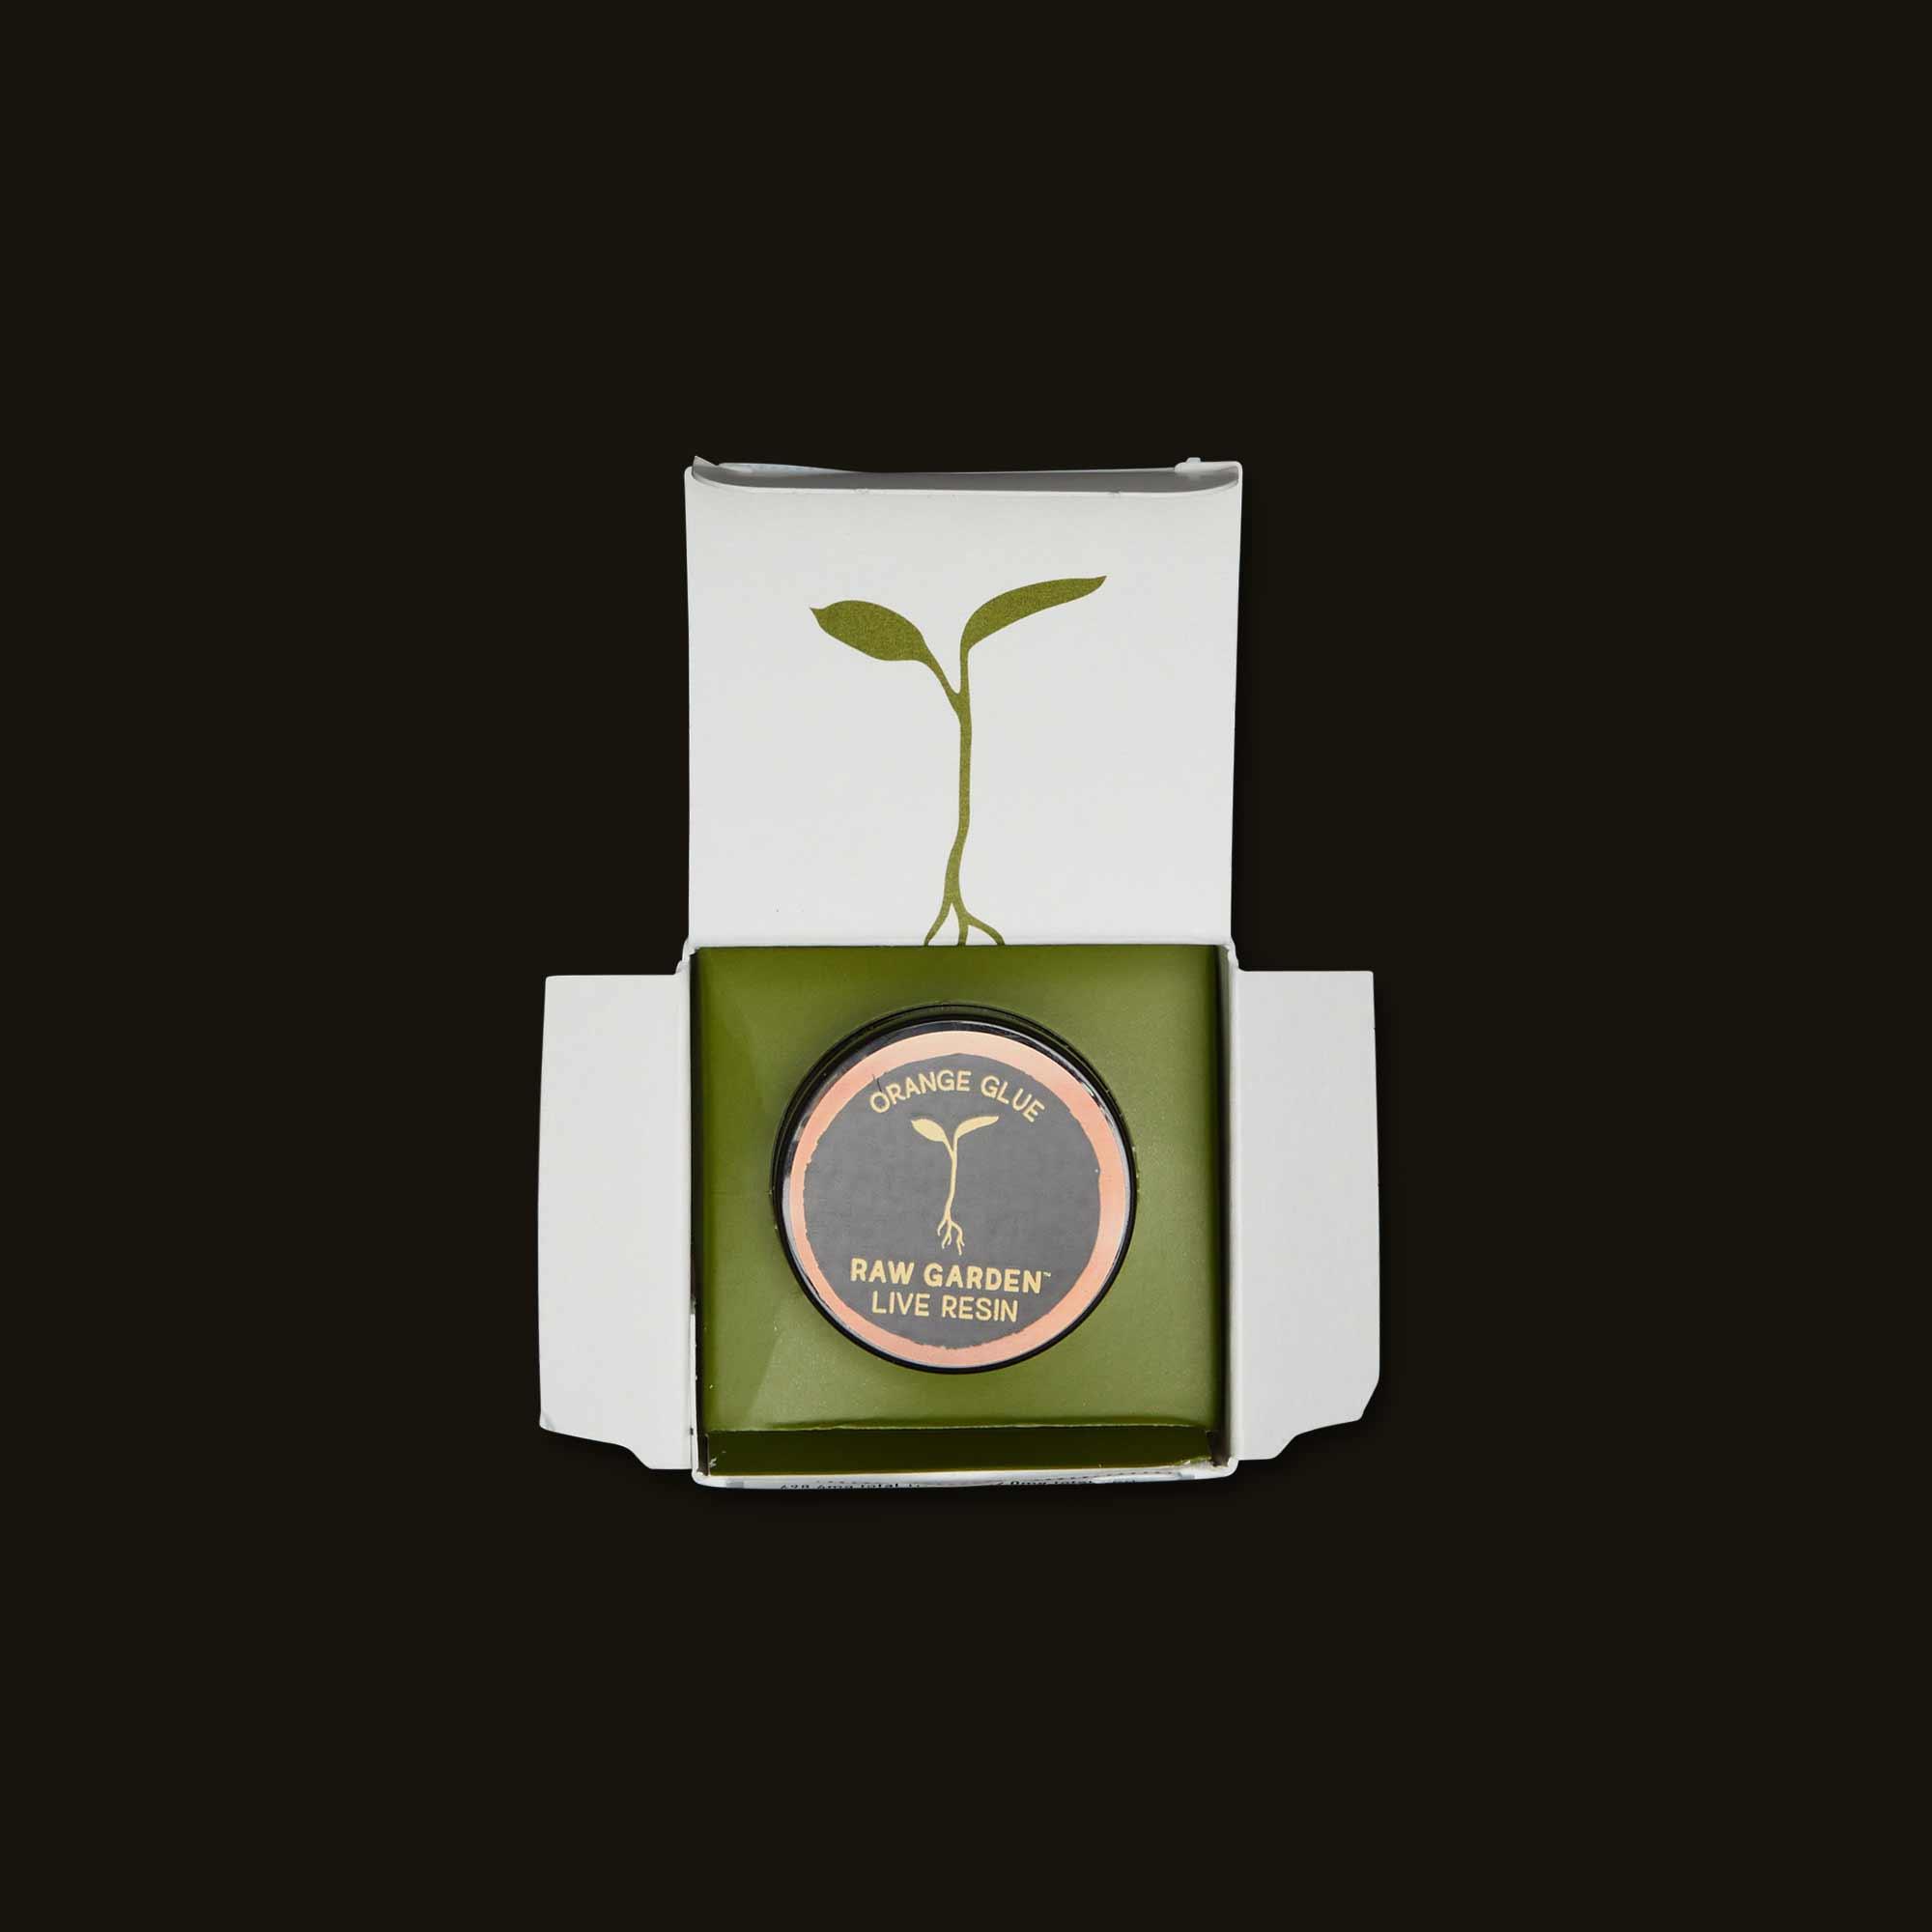 Open Box of Raw Garden Orange Glue Live Resin